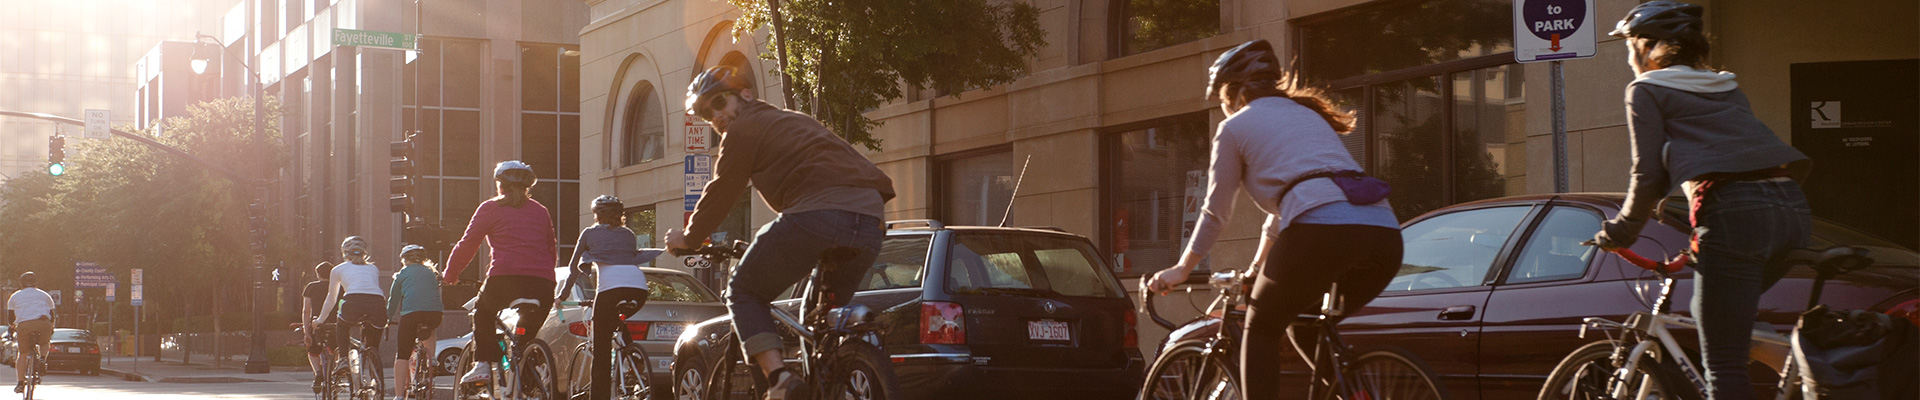 Bike riders riding down the street